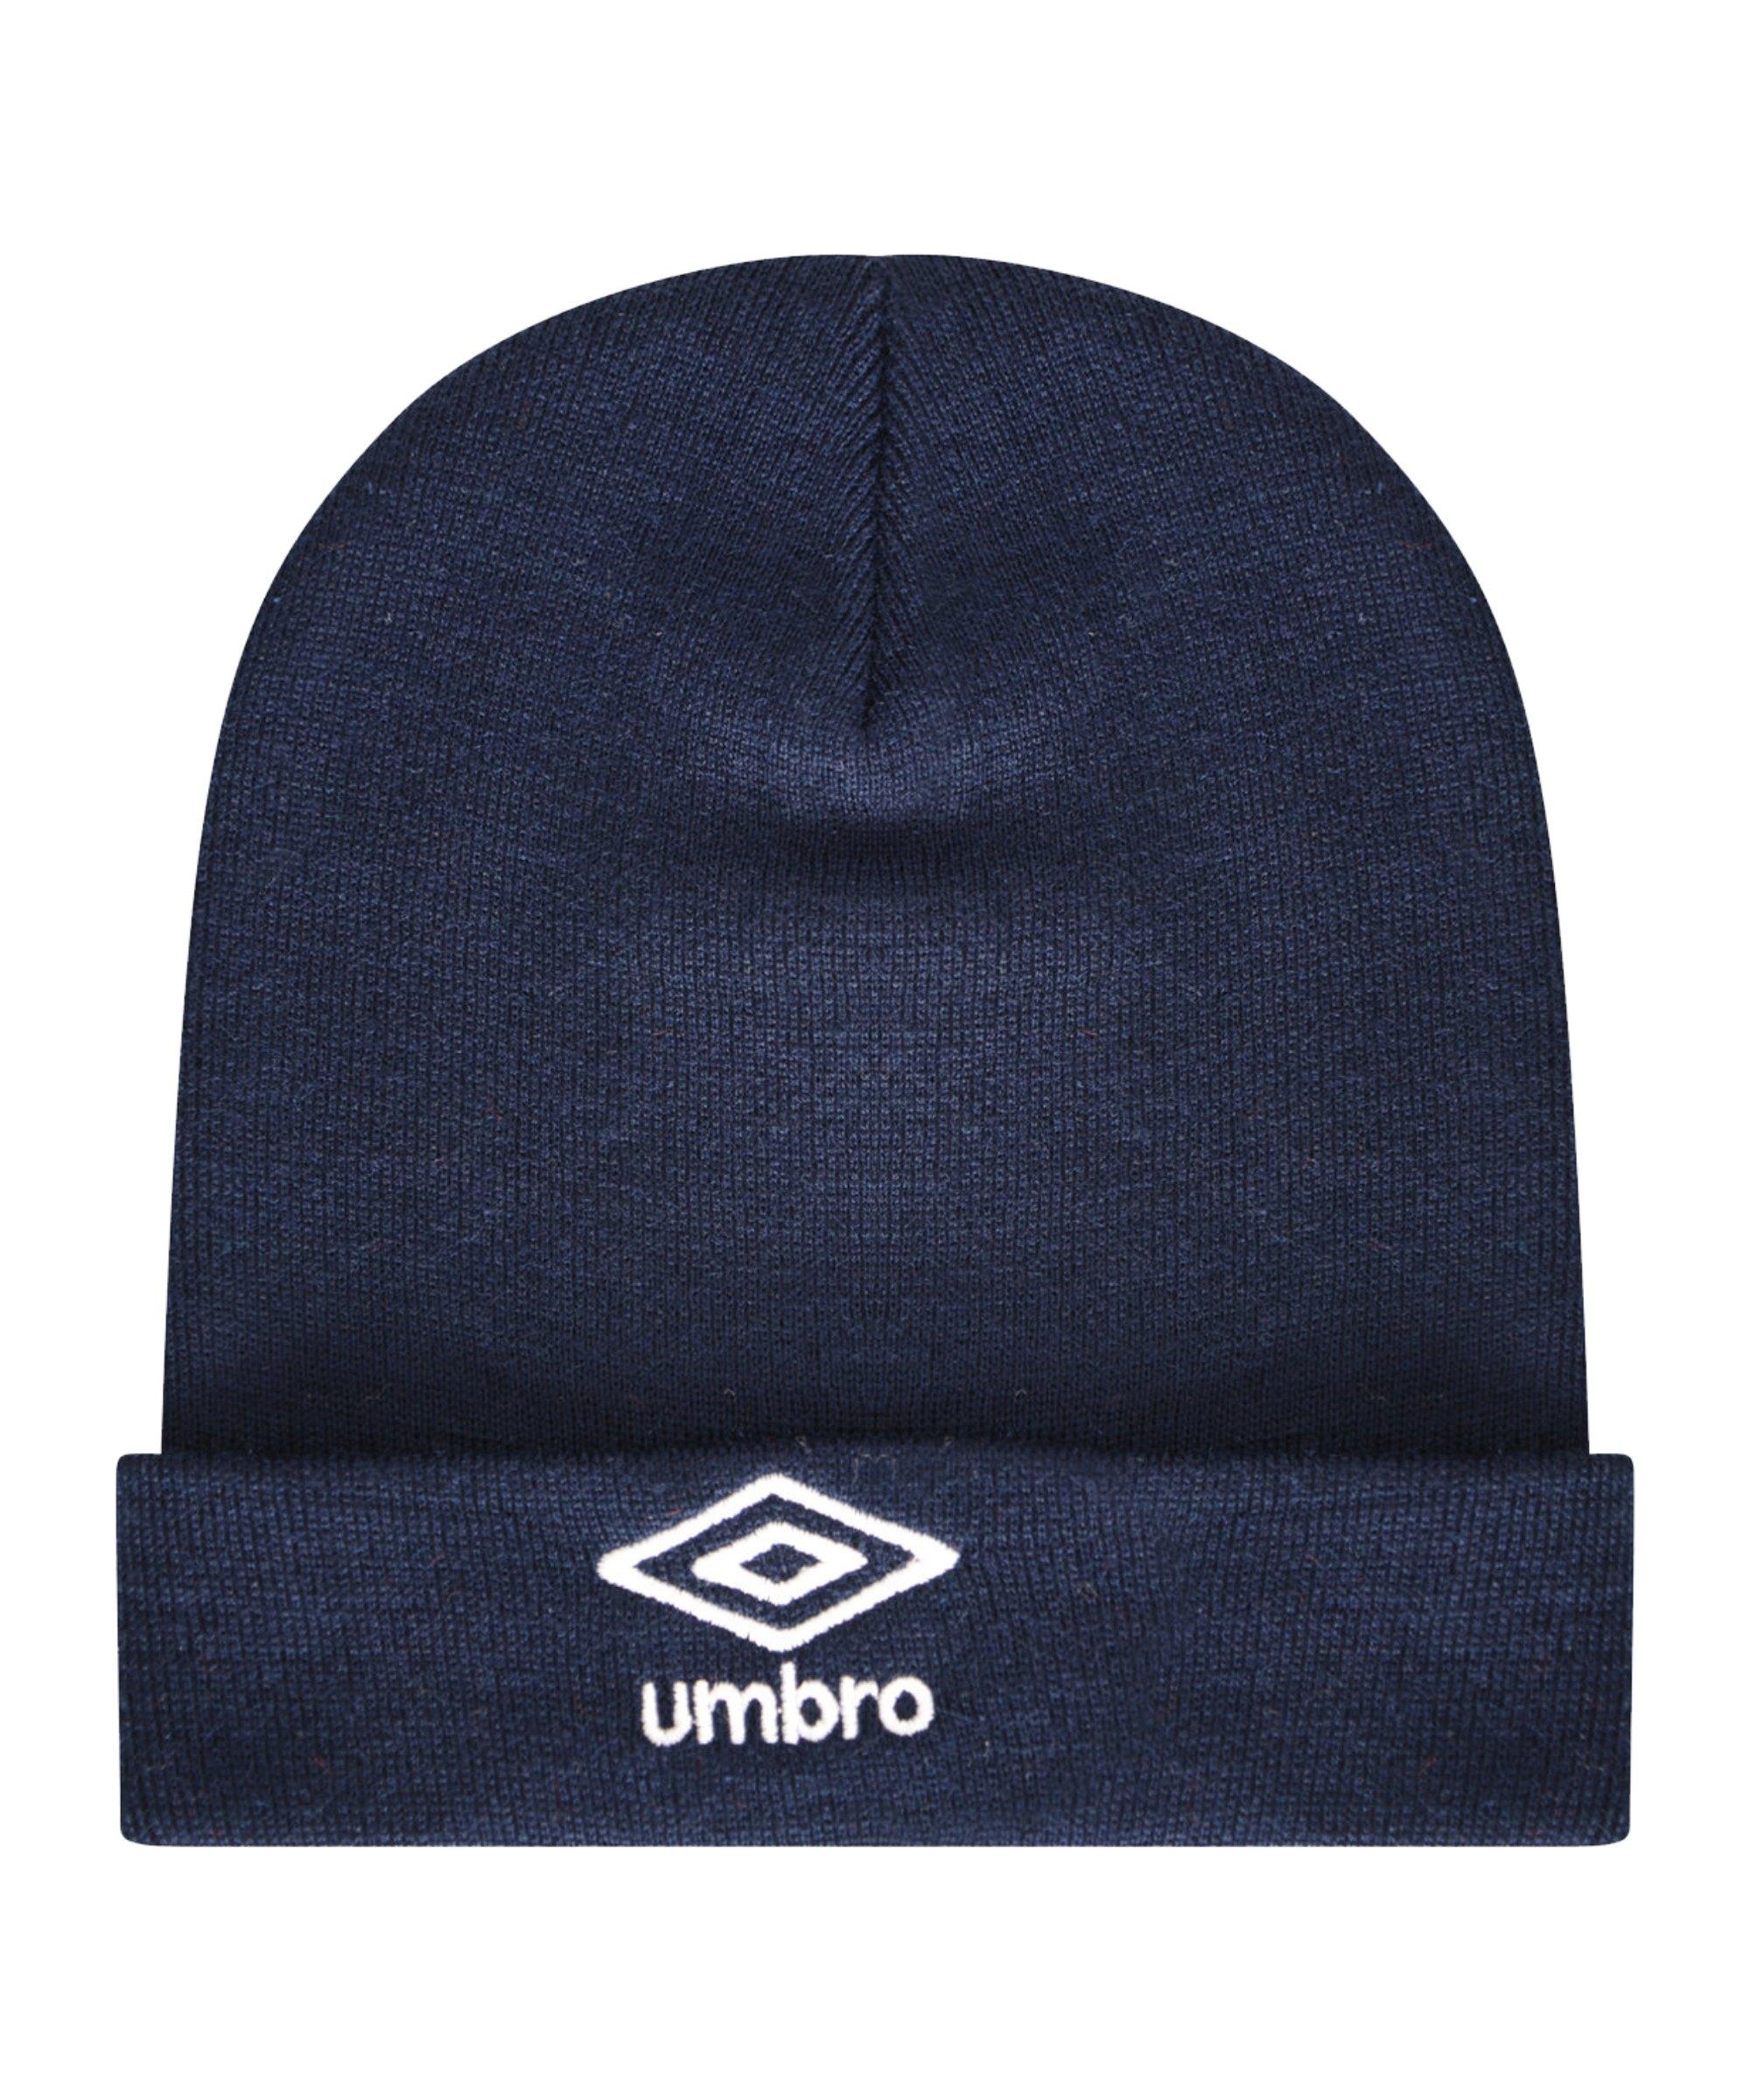 Umbro Ski Mütze Dunkelblau FN84 - blau